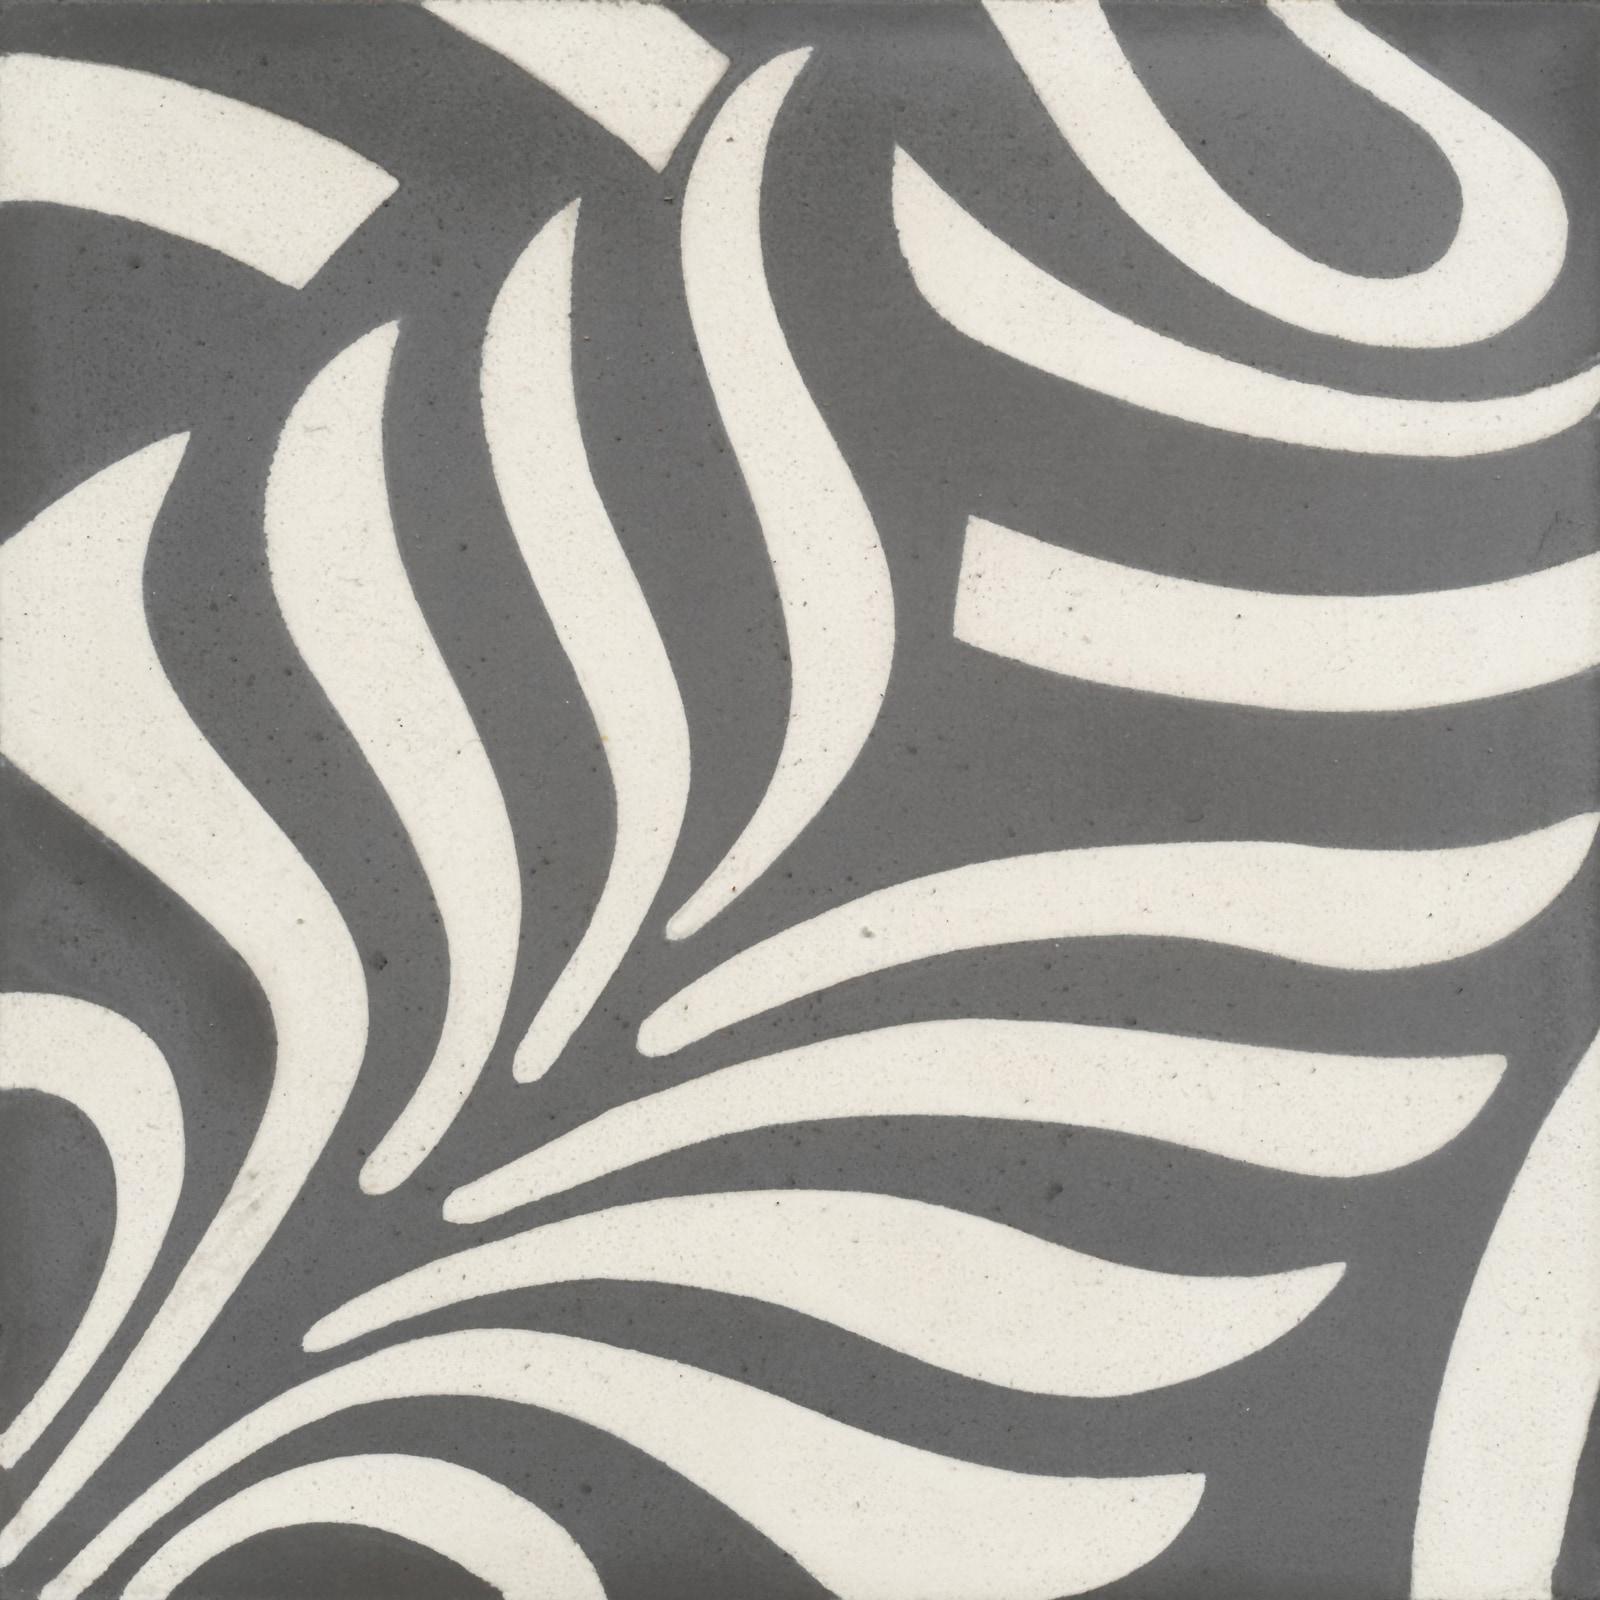 VIA_51128-61Zementmosaikplatten-viaplatten